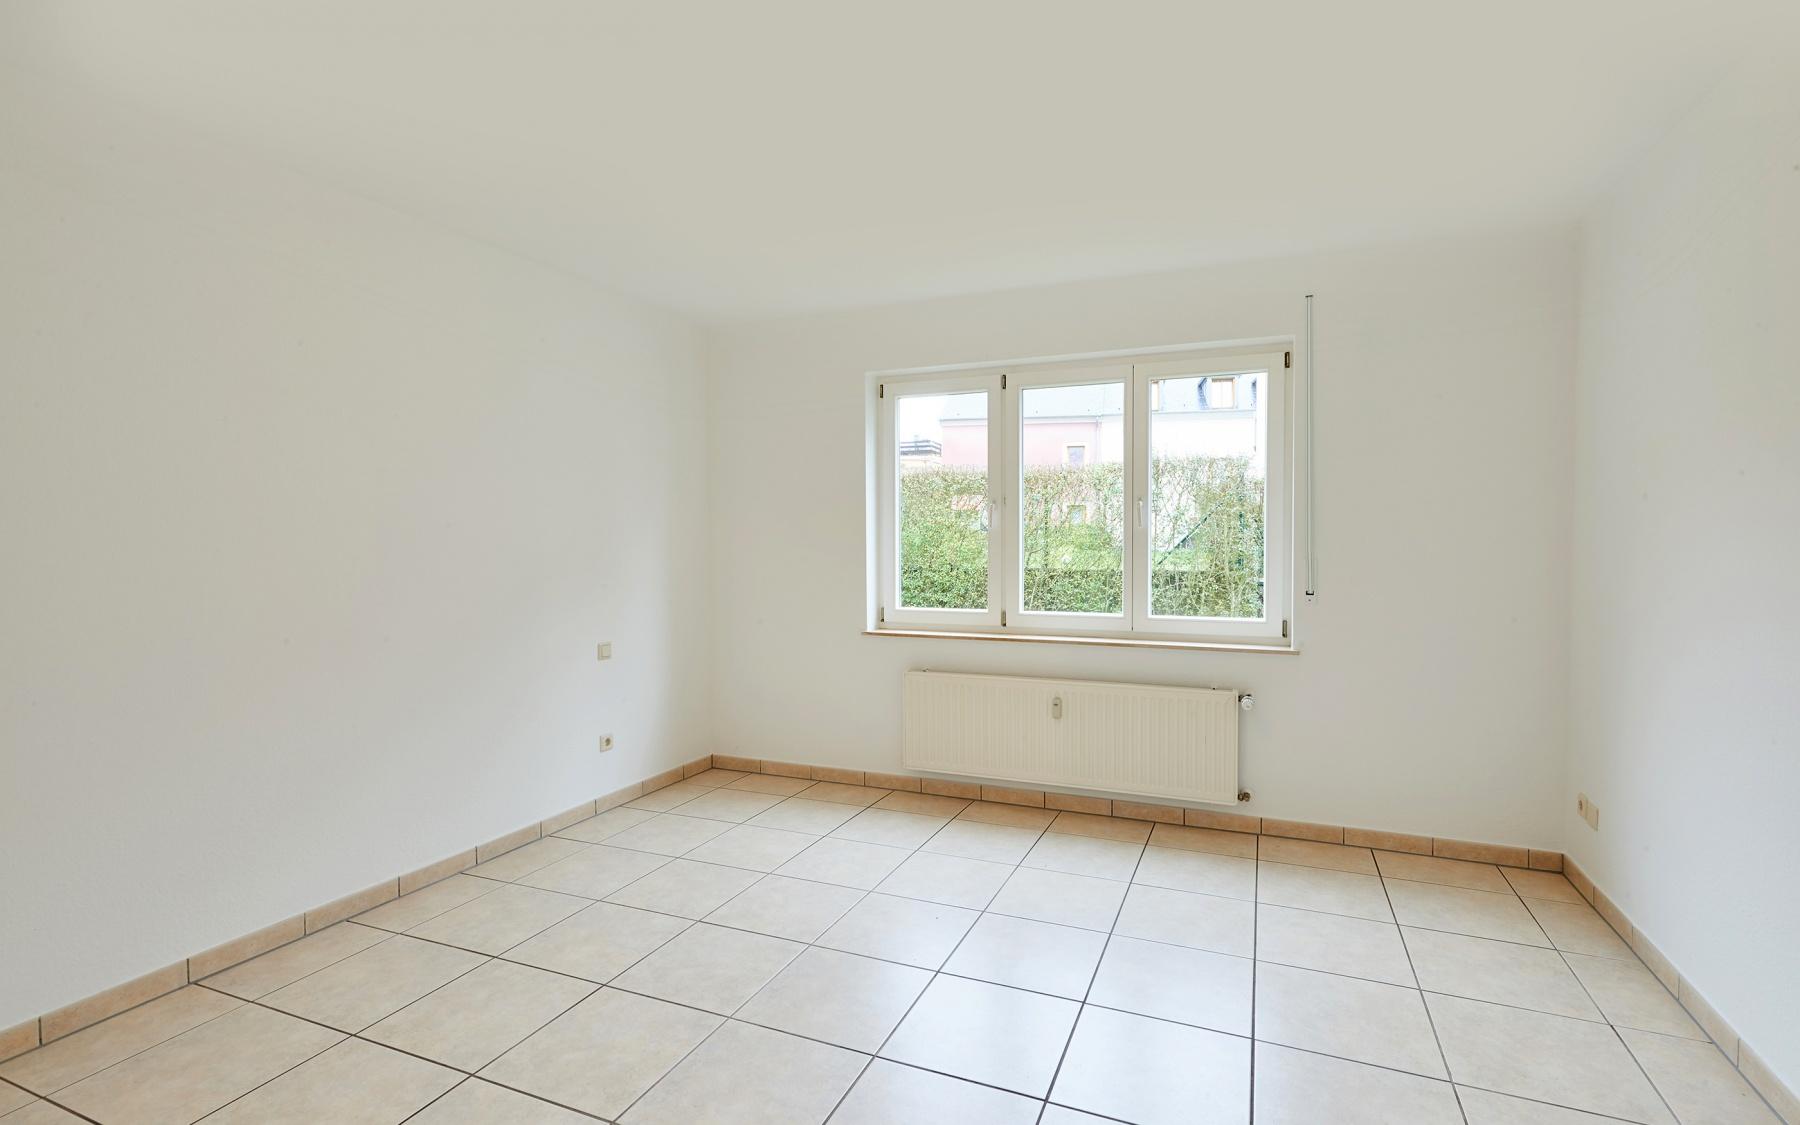 Appartement à Schuttrange